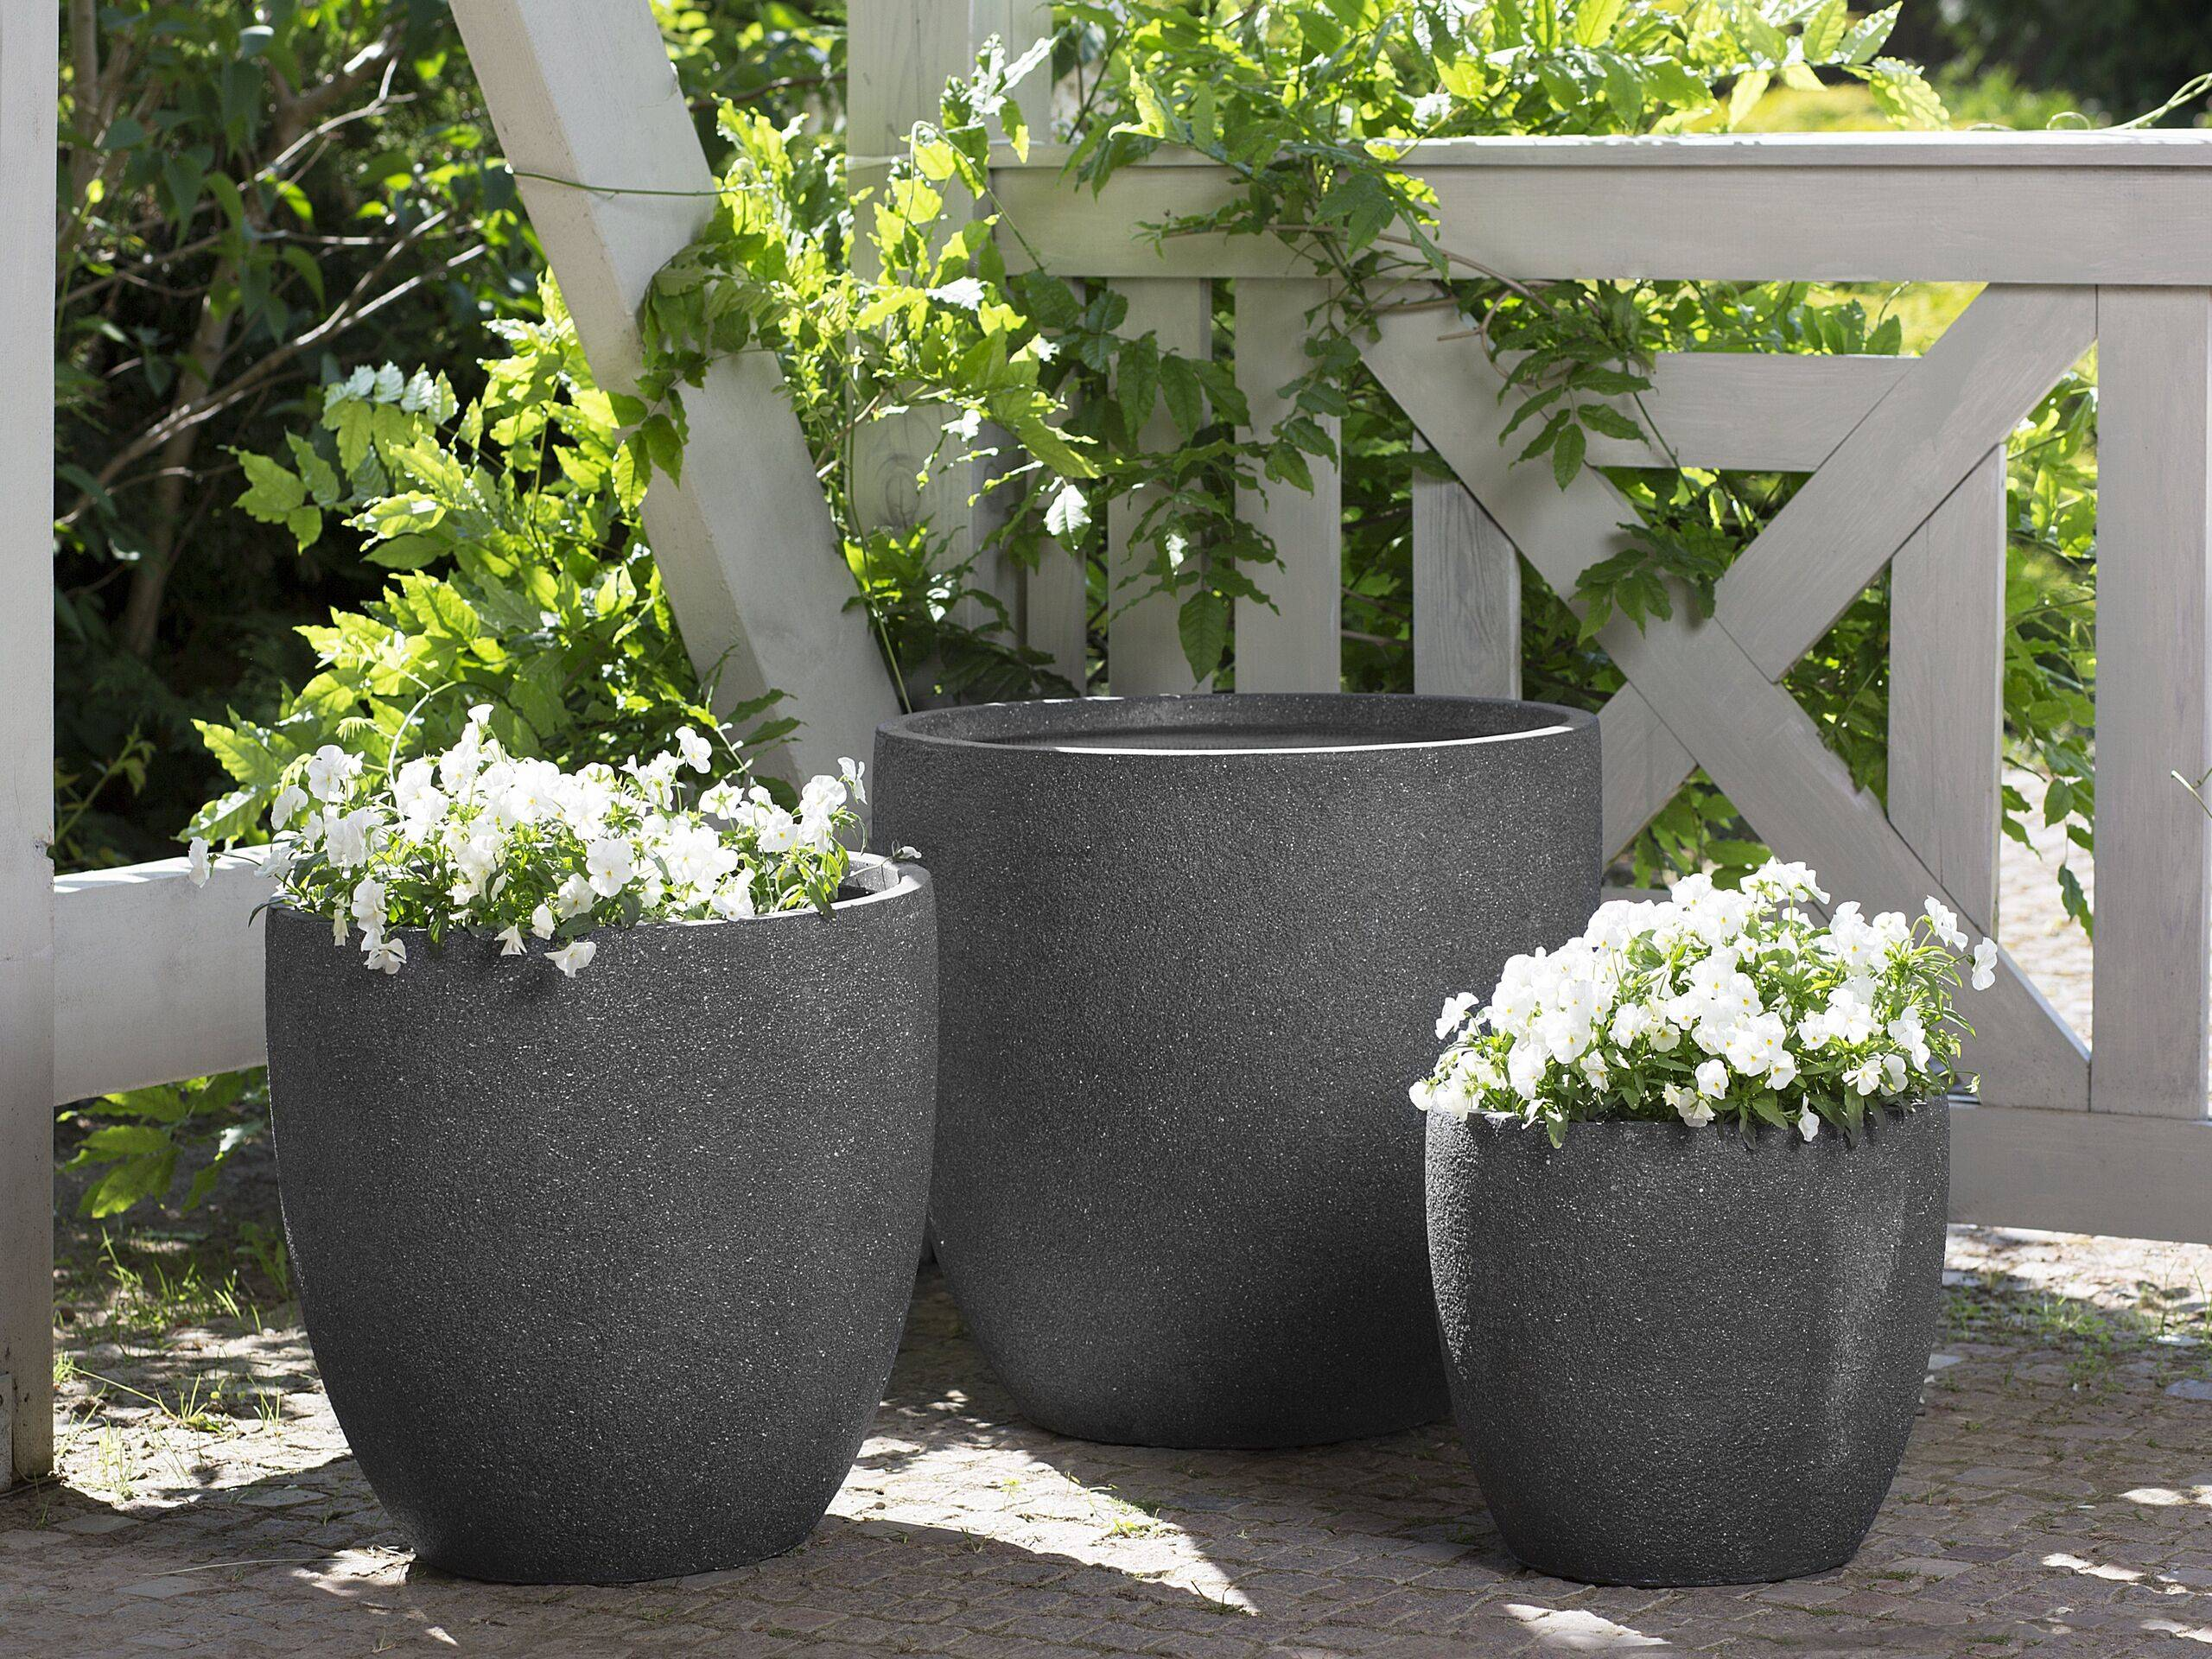 beliani set di 3 vasi rotondi in fibra di argilla grigio scuro varie dimensioni